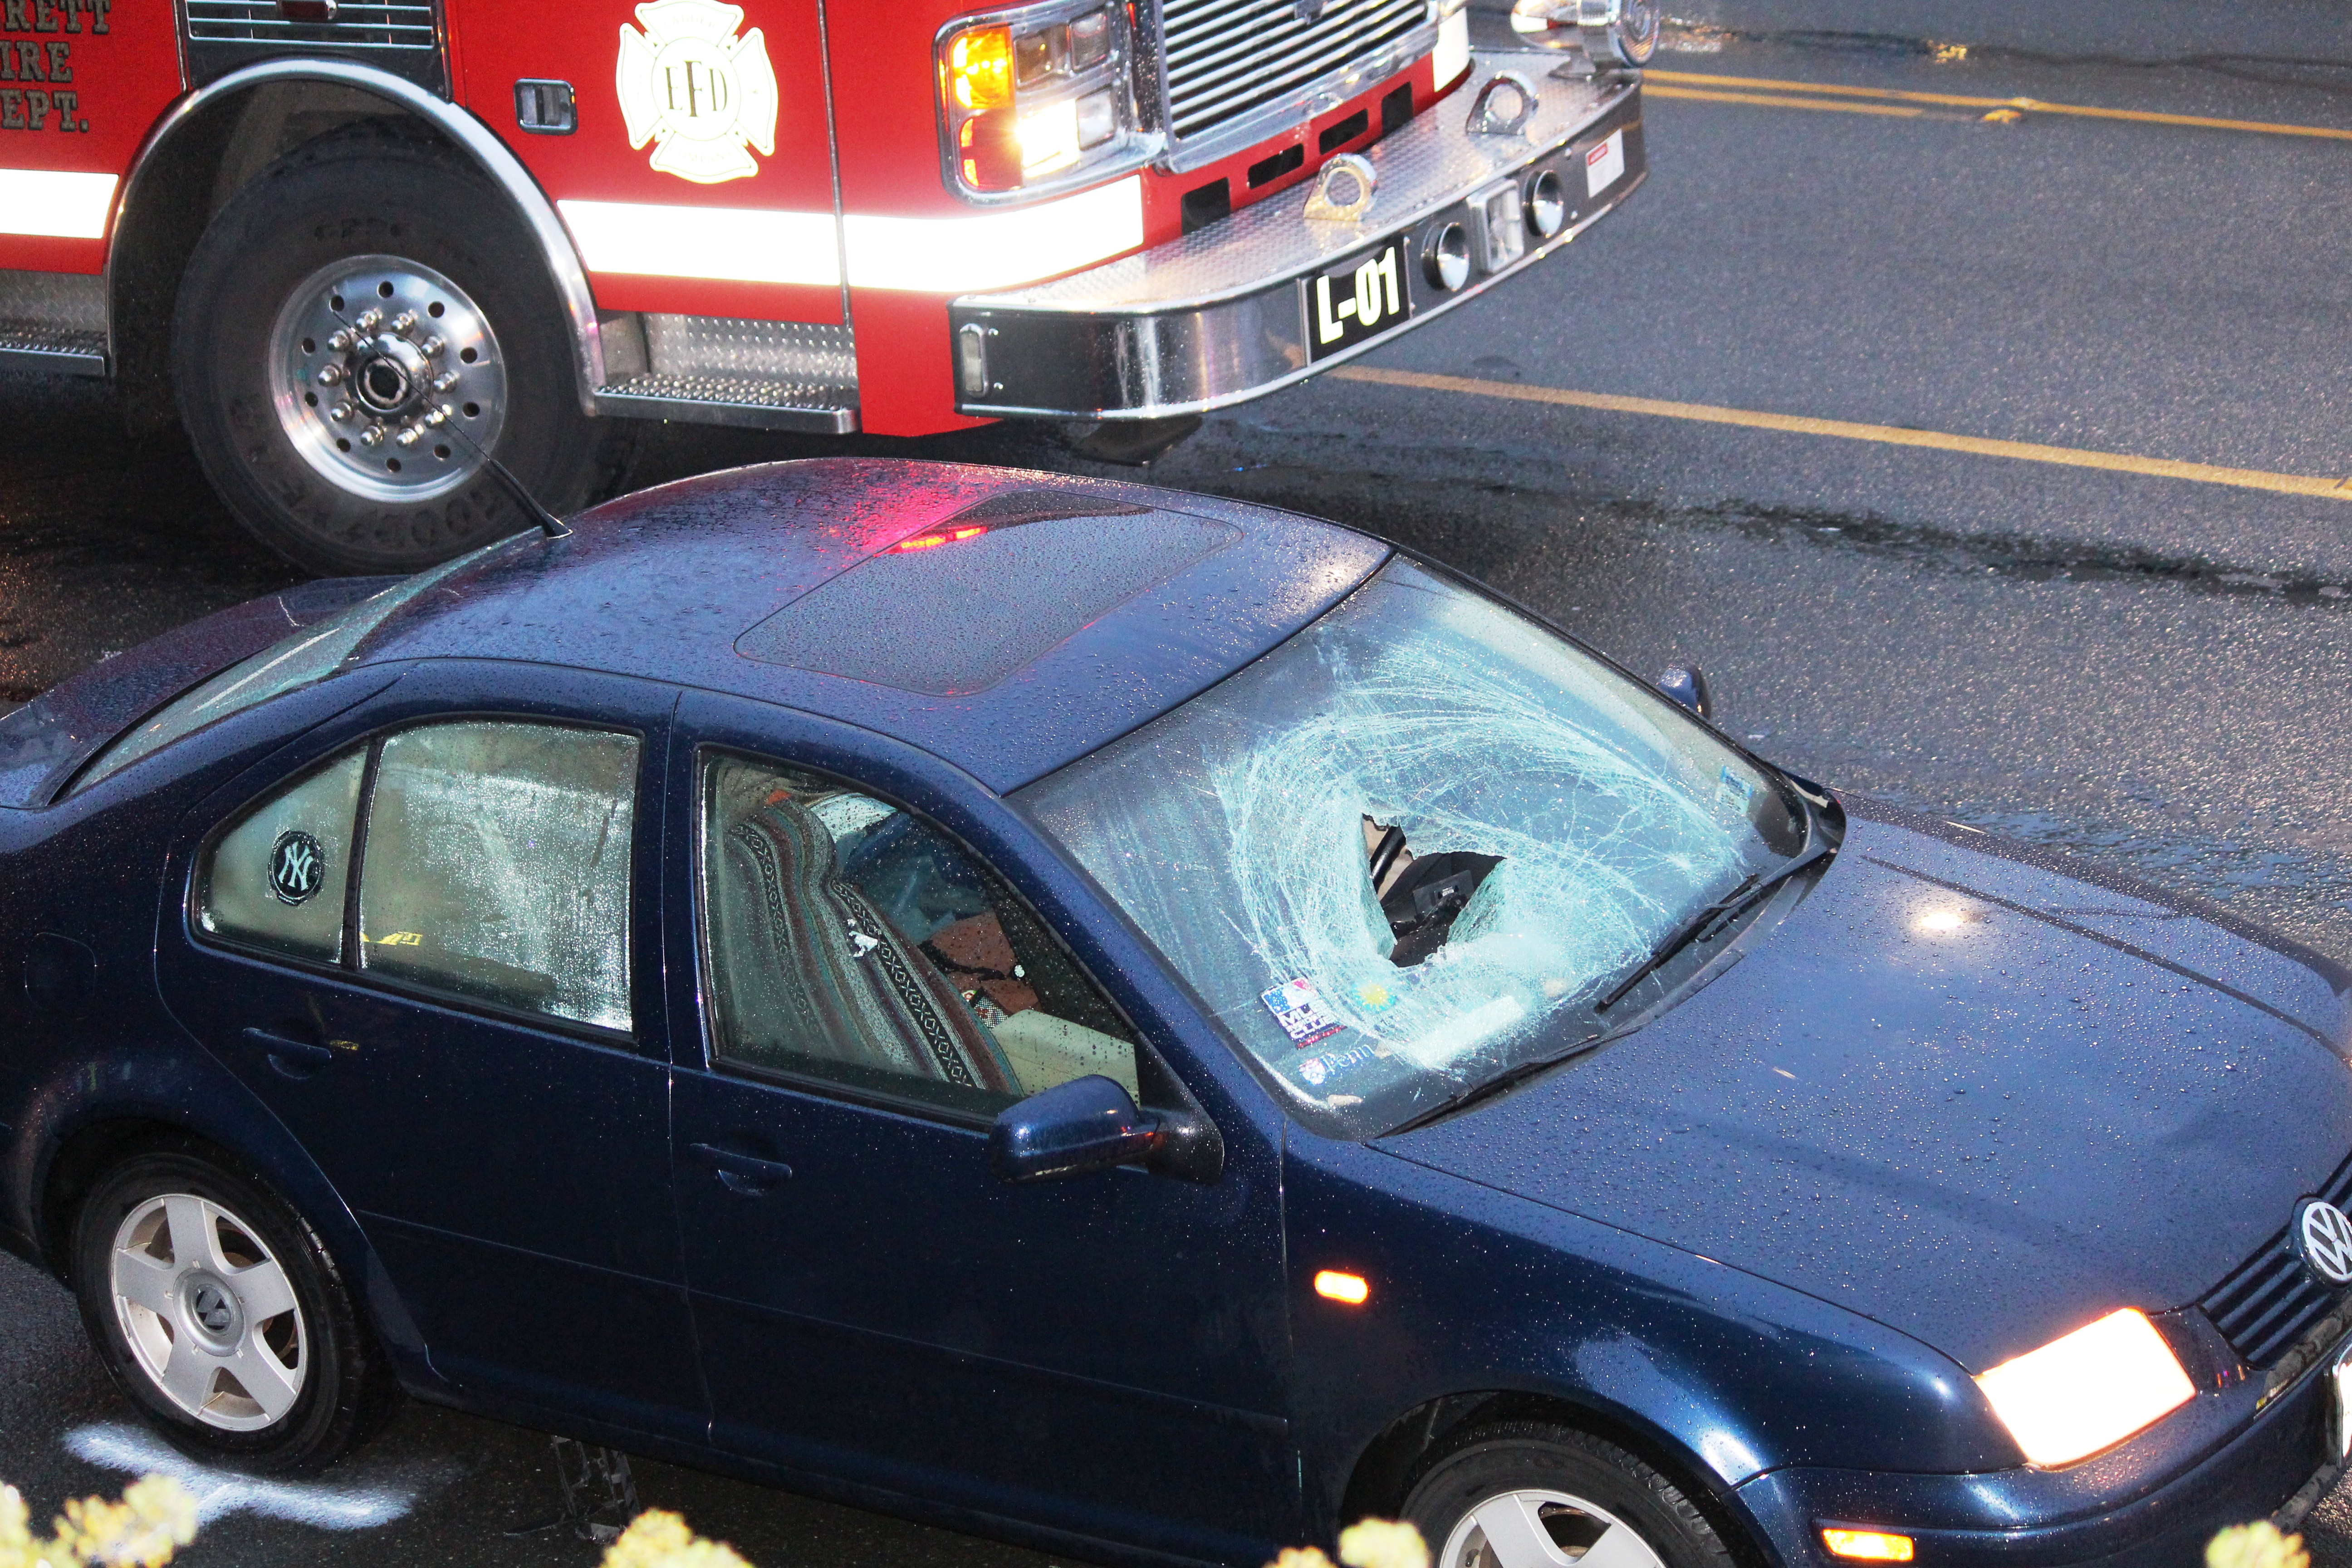 Car Vs Pedestrian Crash At 40th And Rucker